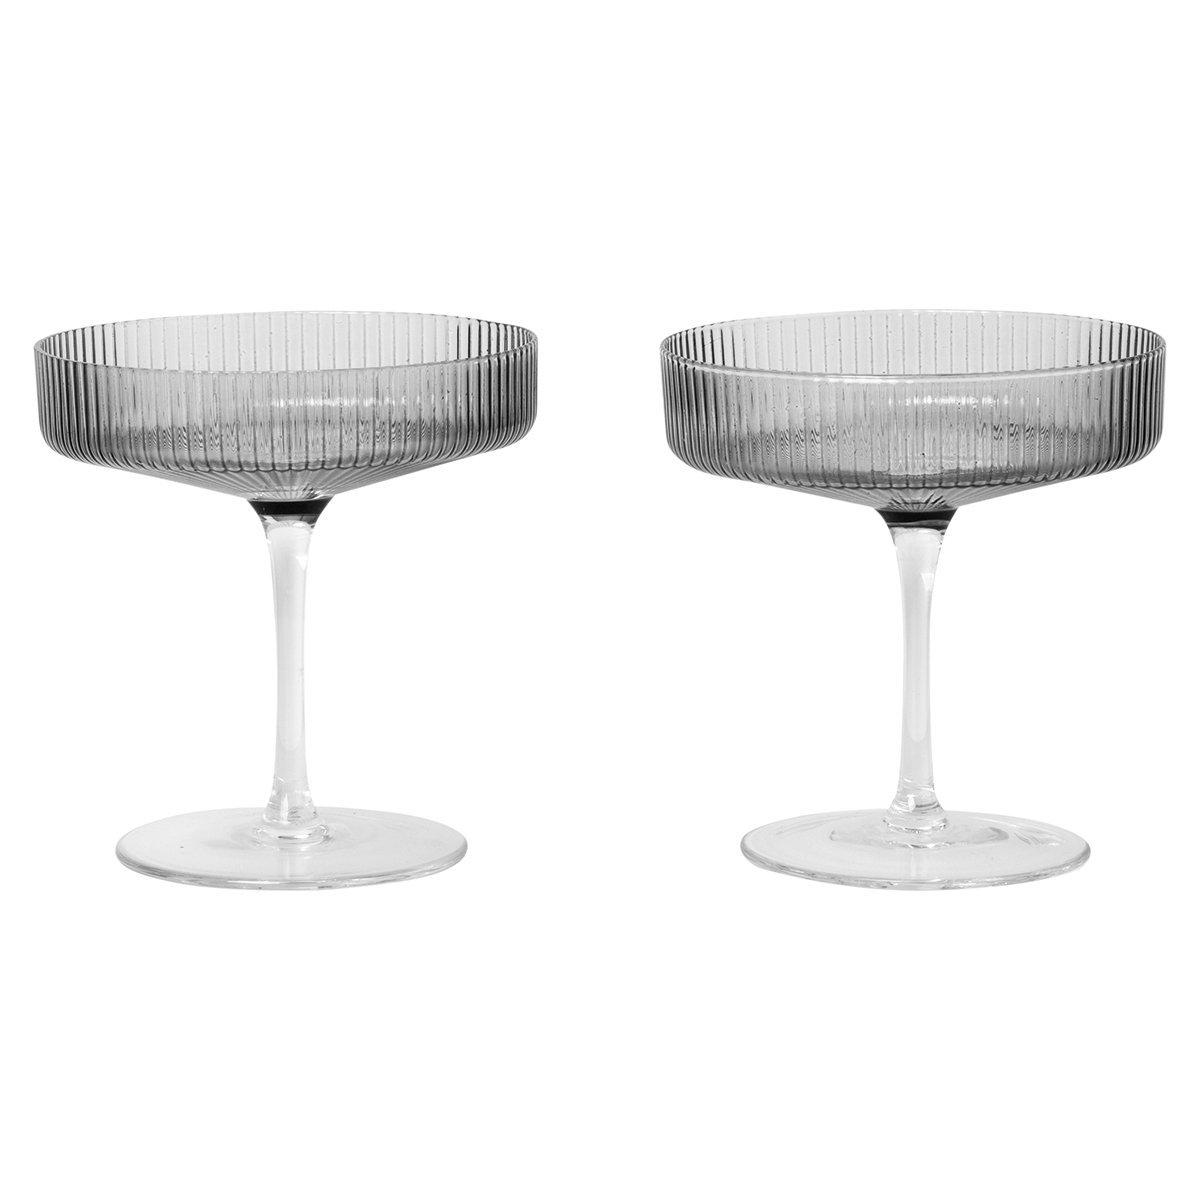 Ferm Living Ripple Champagneglas, set van 2 - Grijs Gerookt